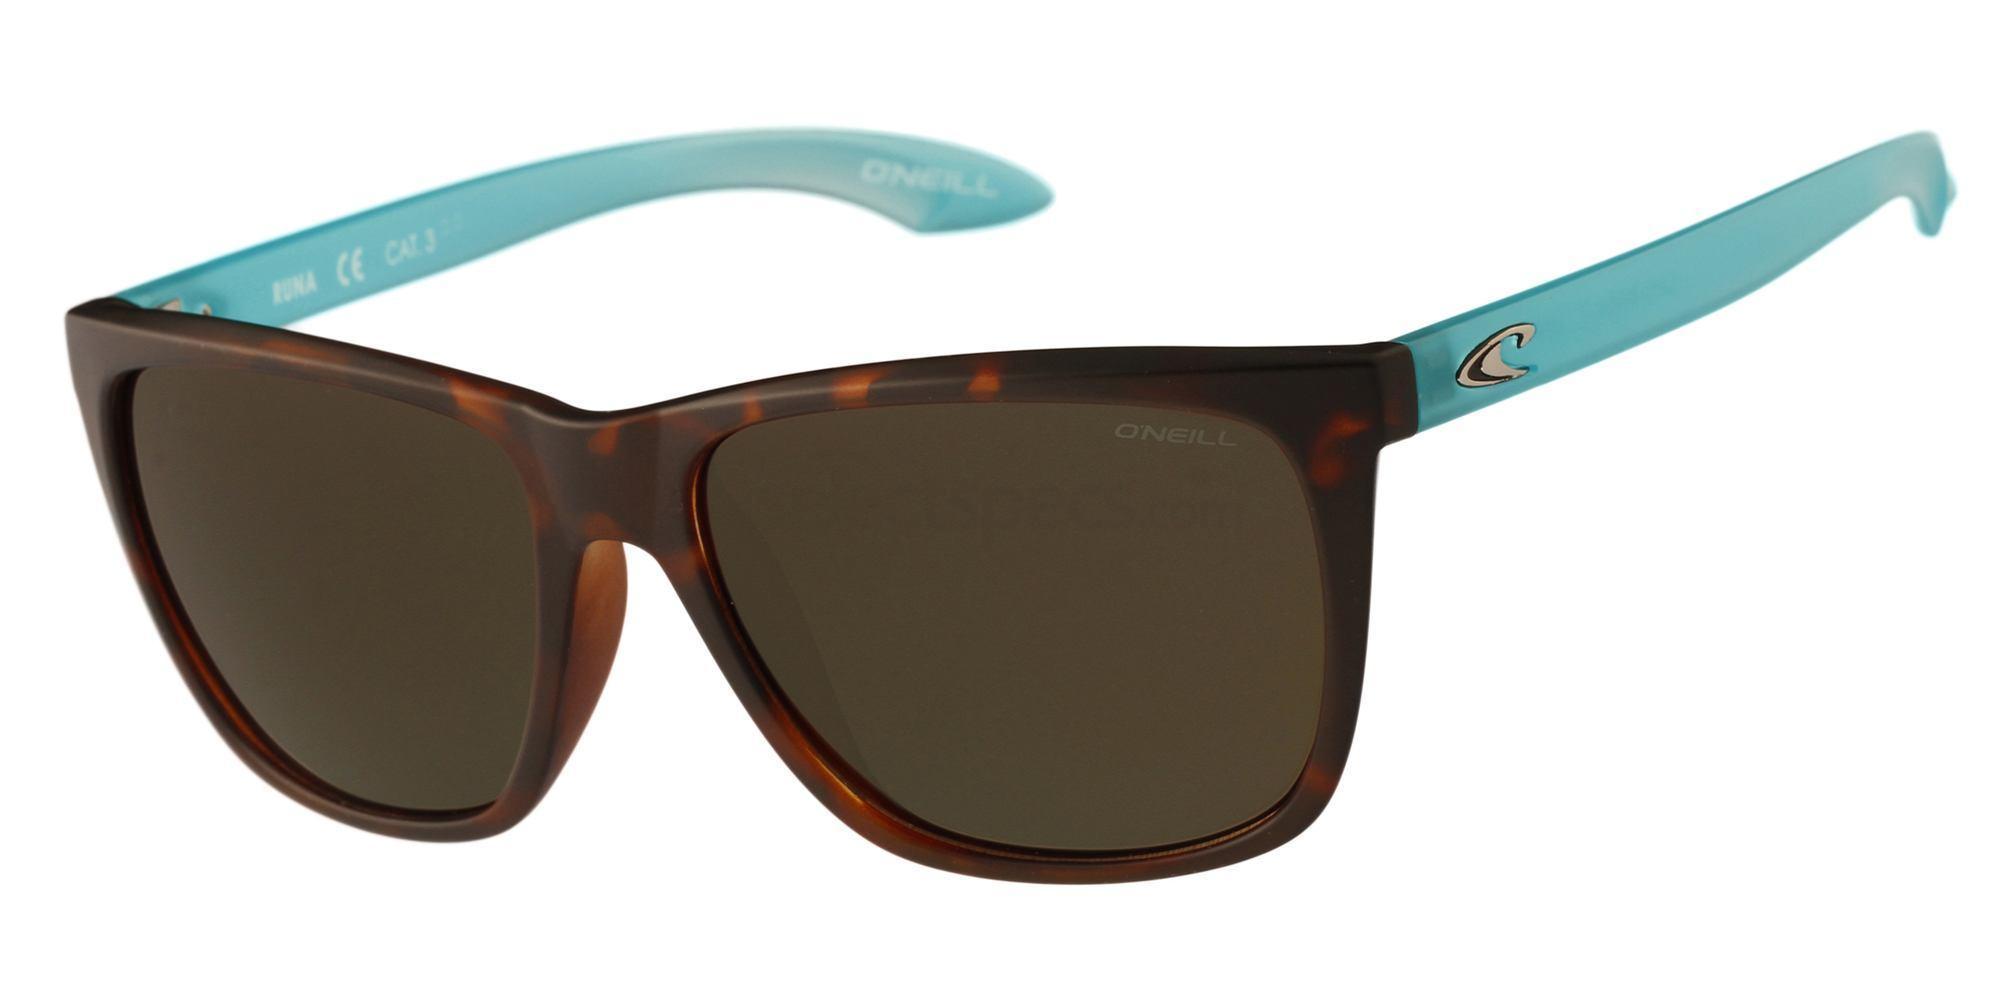 102P ONS-RUNA Sunglasses, O'Neill